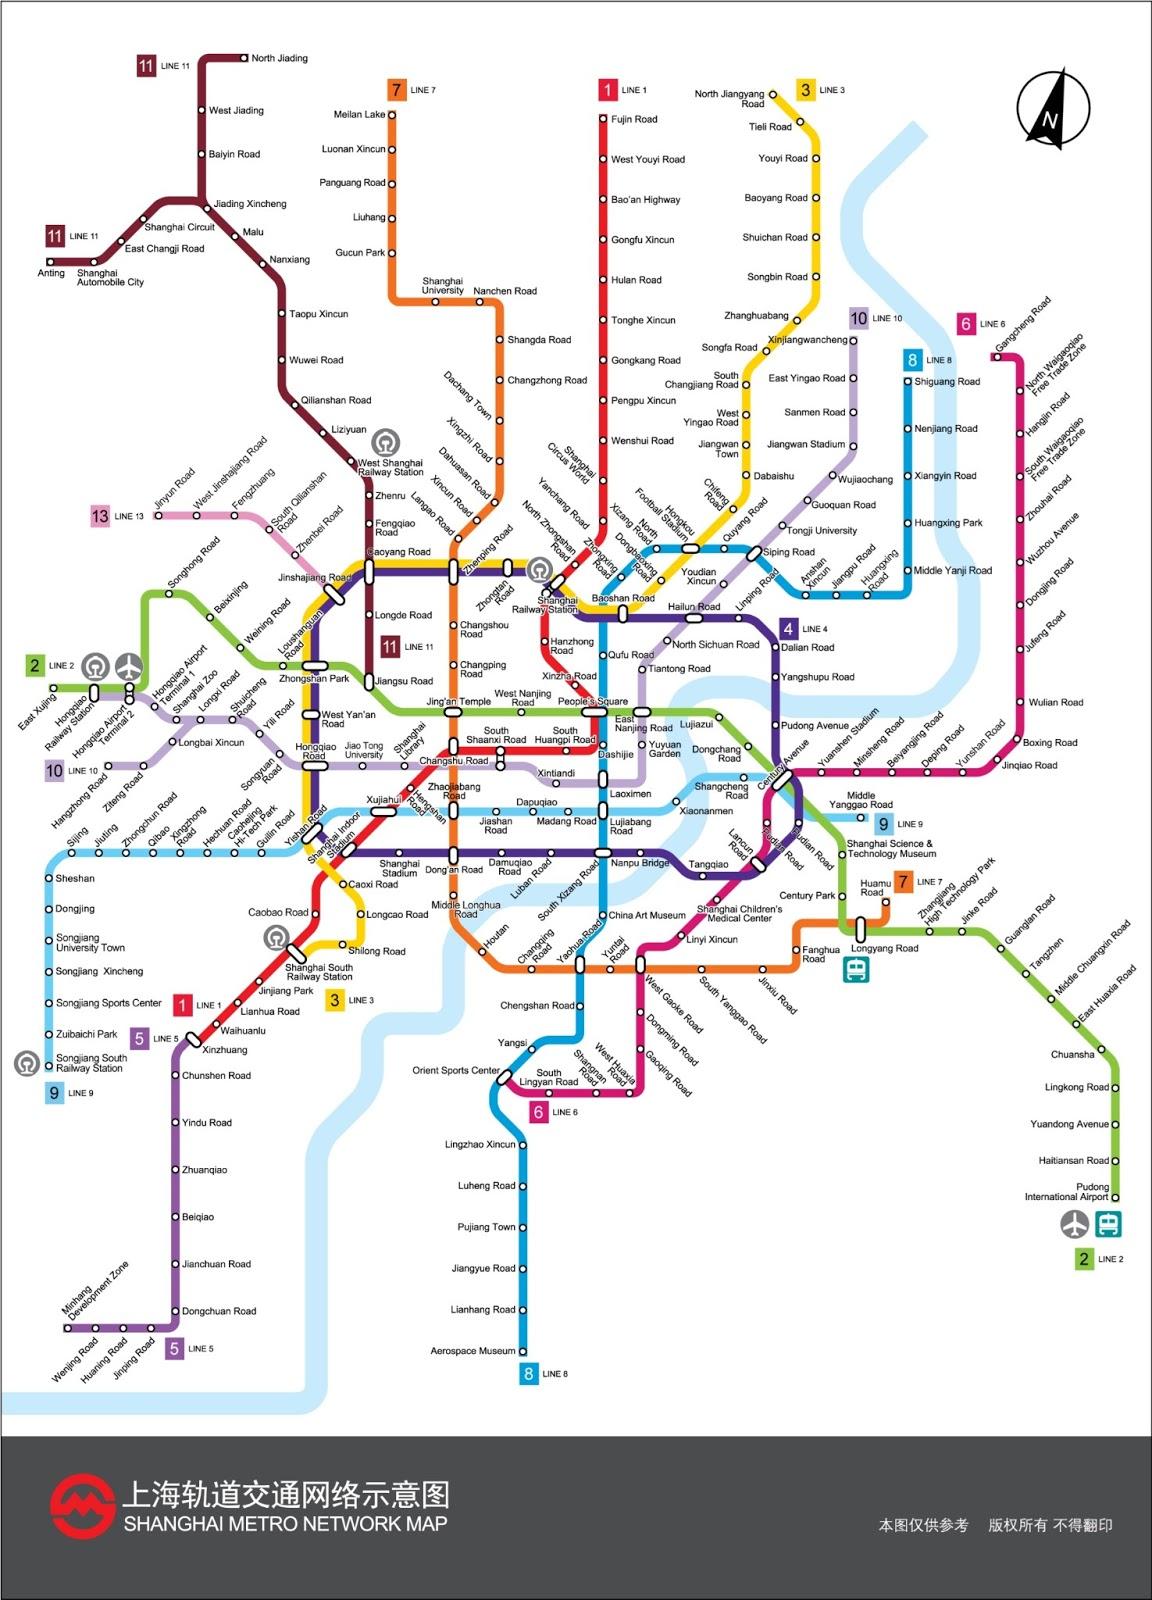 shanghai metro map in 2013